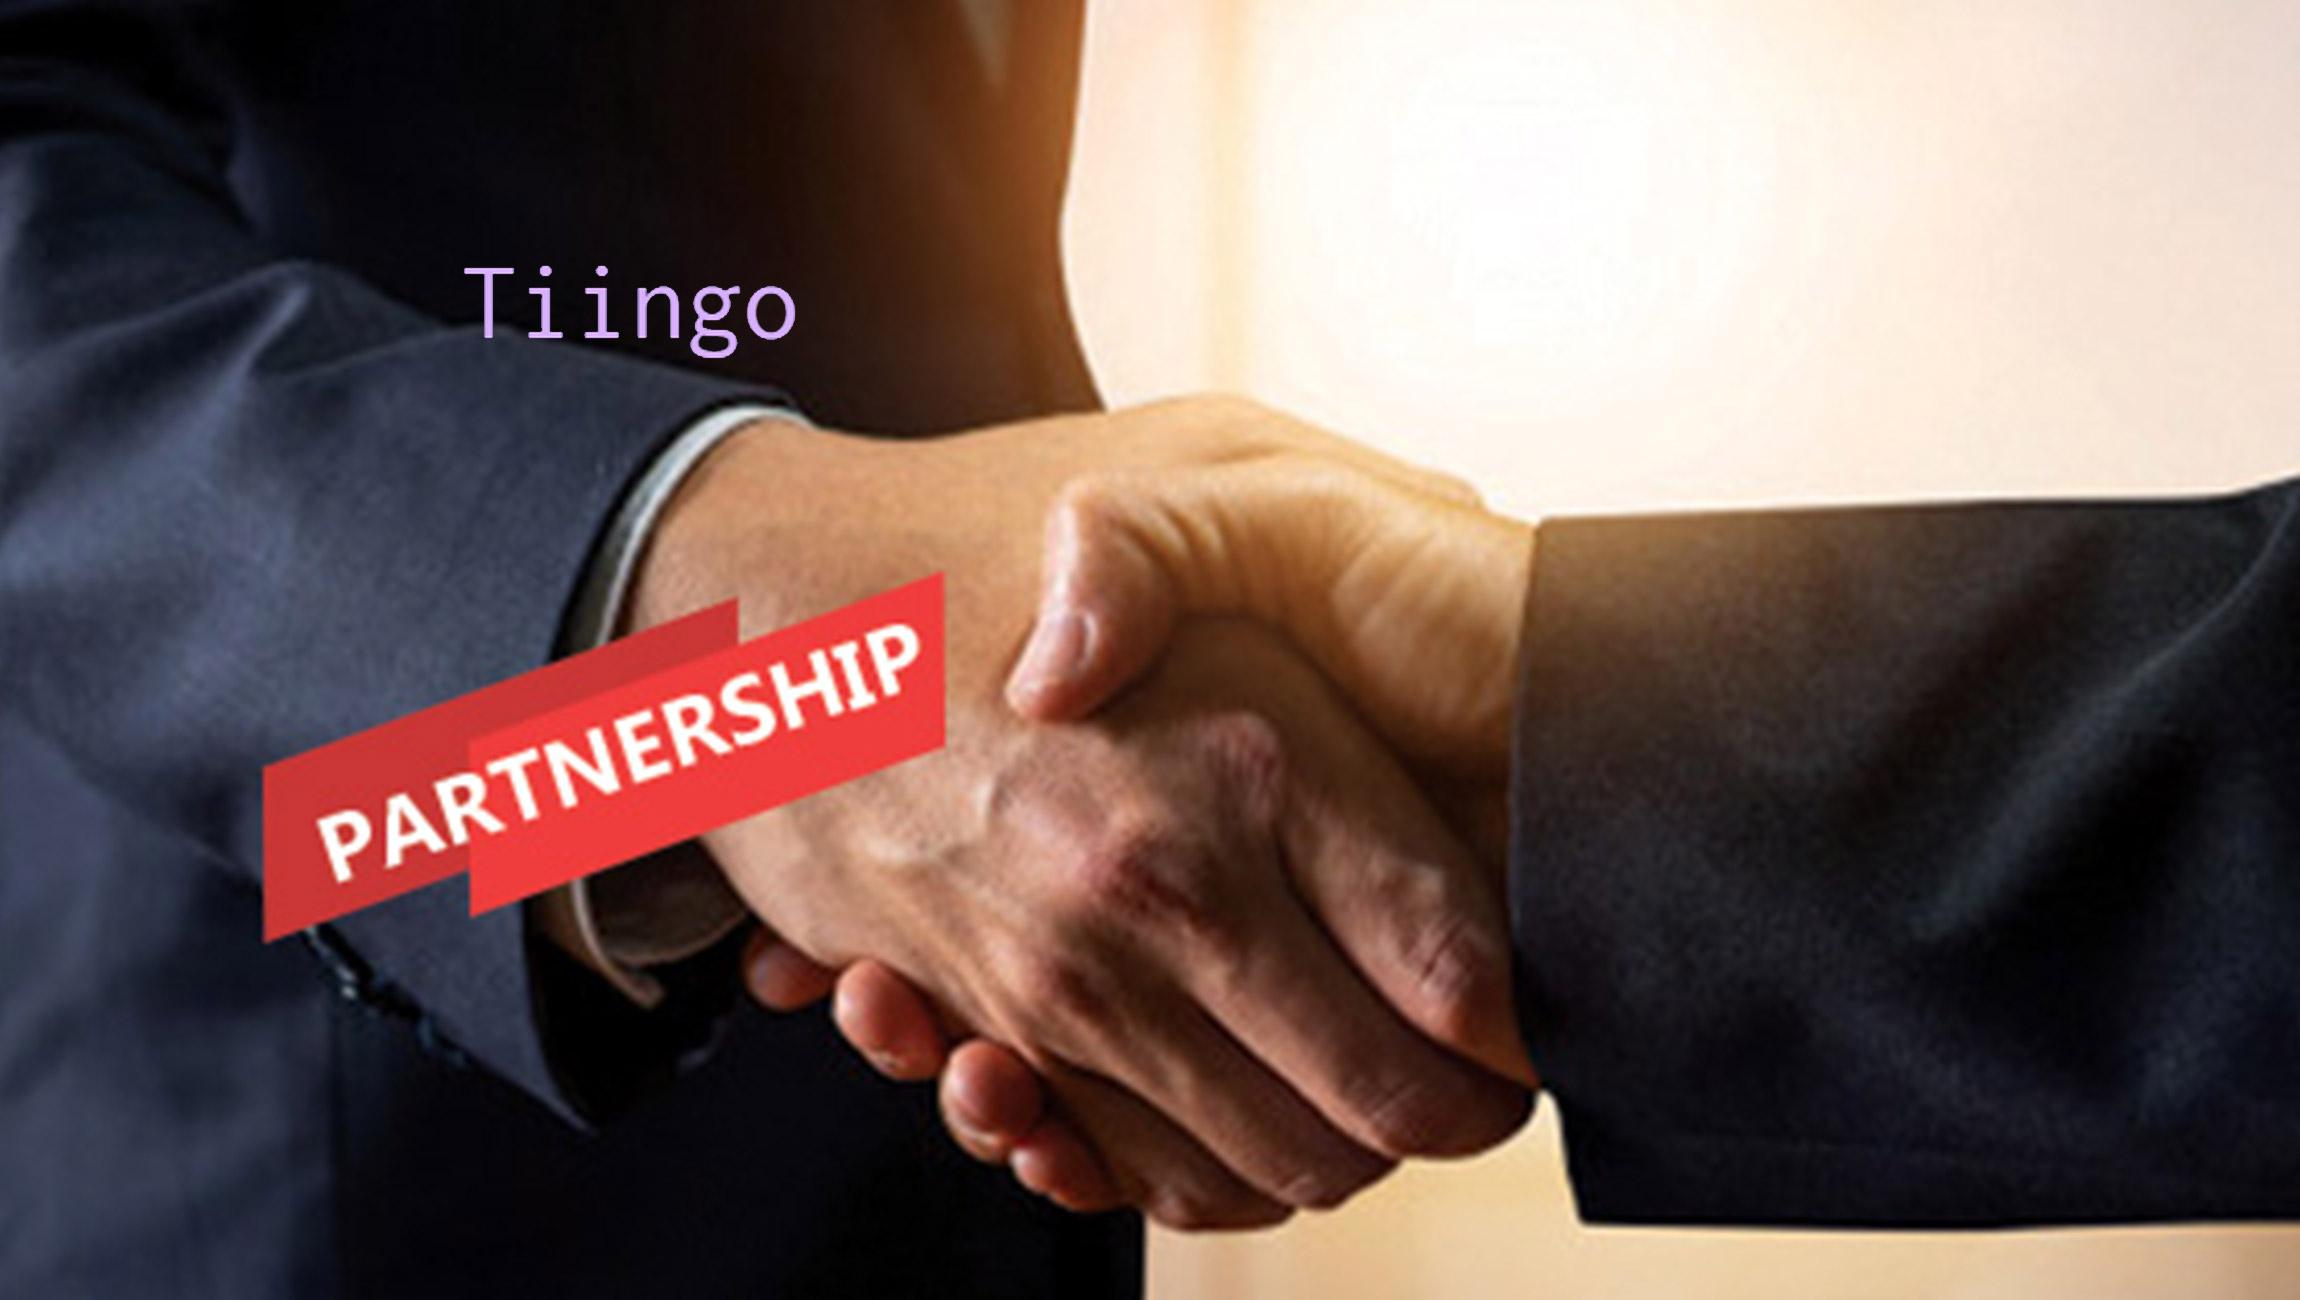 Tiingo Joins FinTech Sandbox as Data Partner to Enable FinTech Startups to Do Good